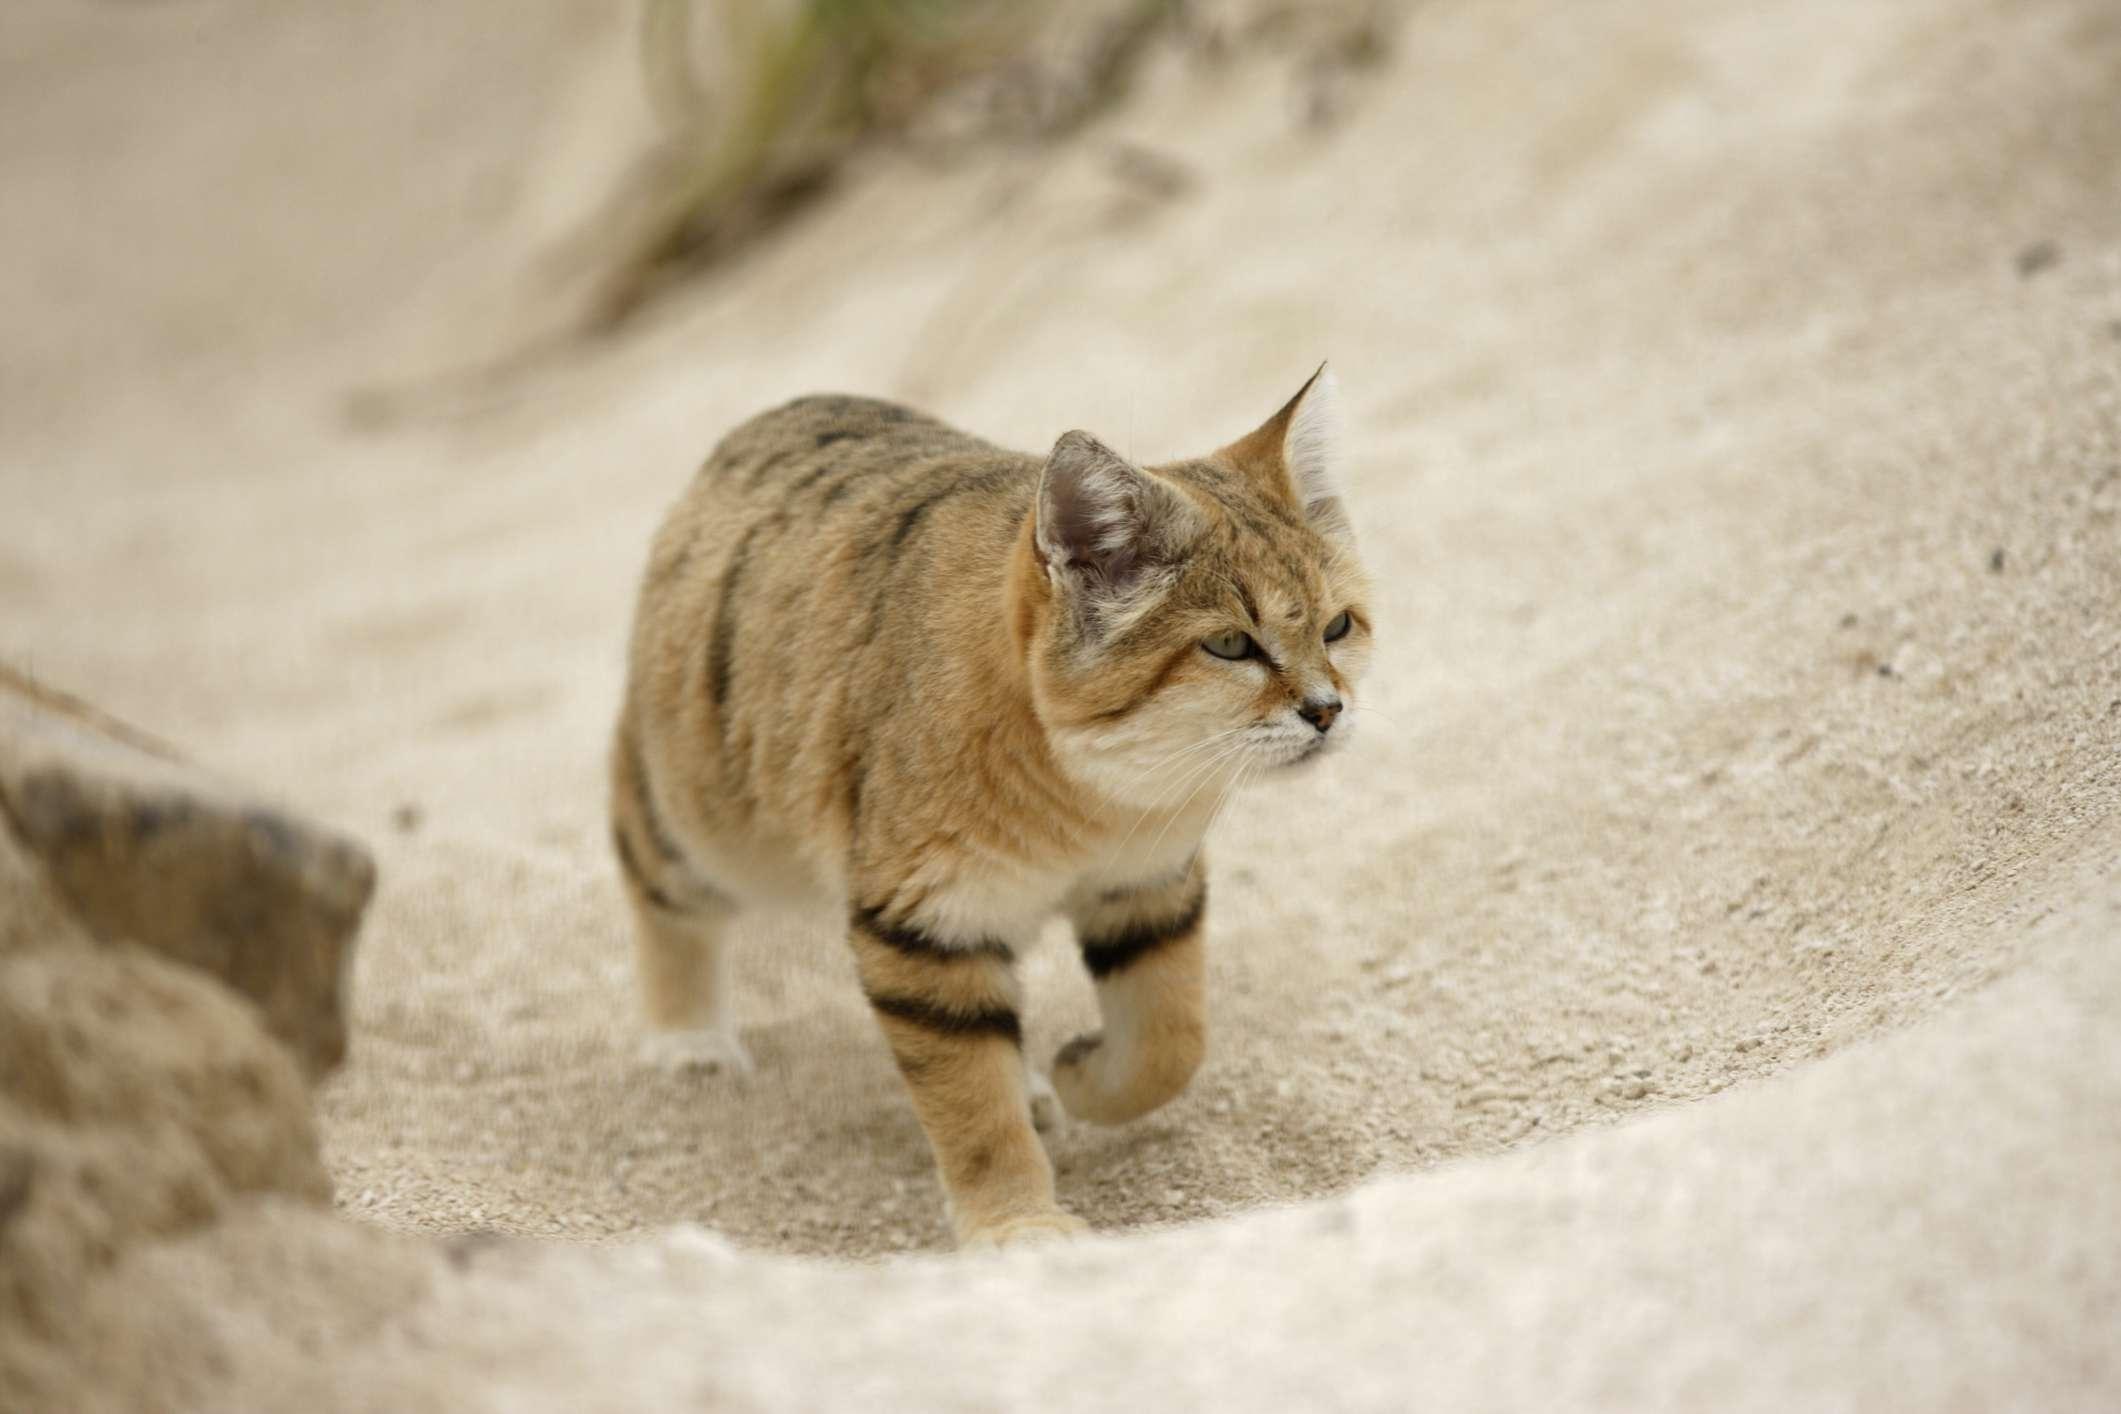 sand cat walks uphill through loose sand leaving no footprints